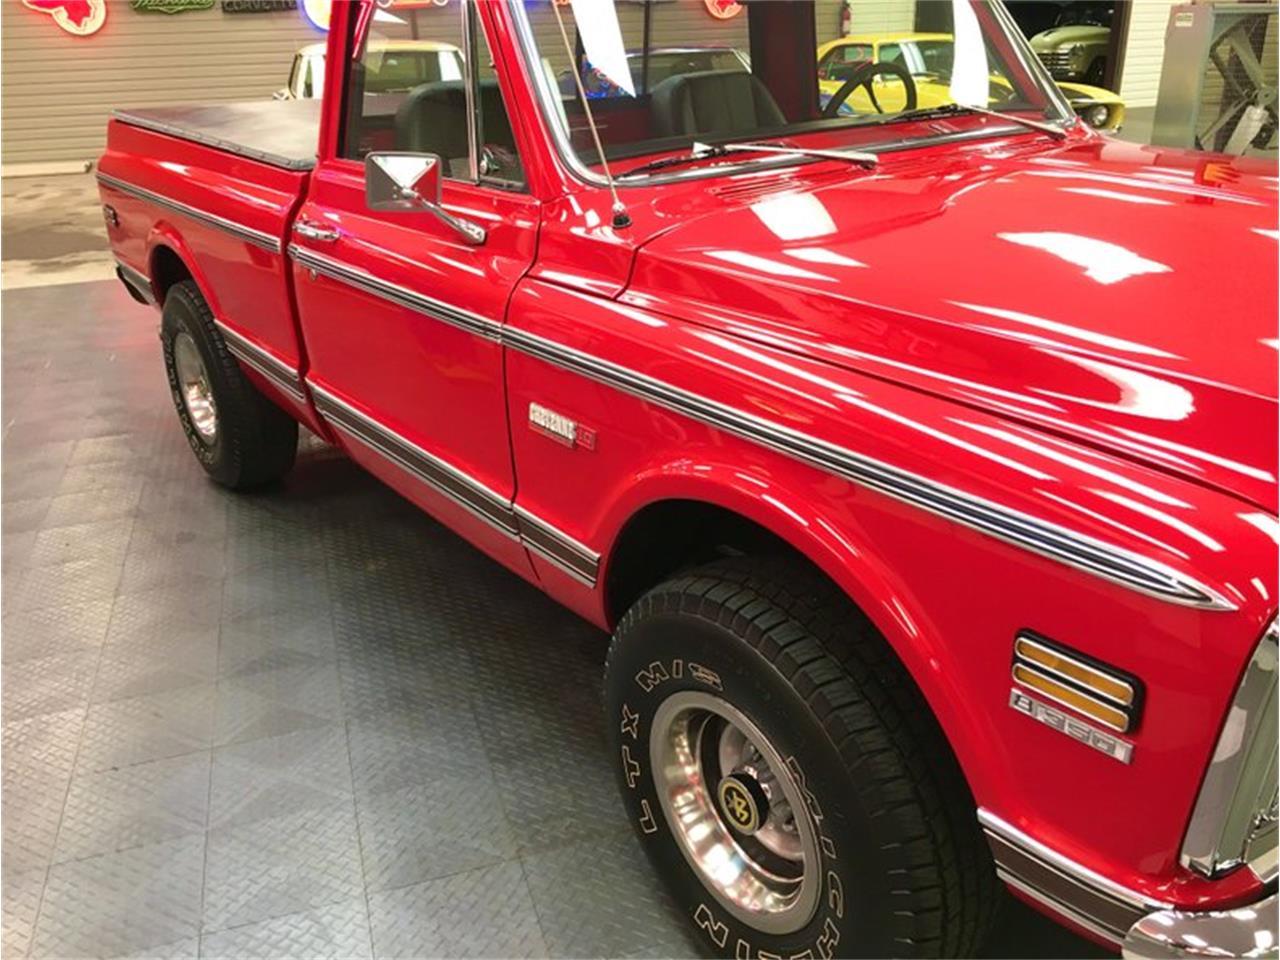 1972 Chevrolet Cheyenne (CC-1266885) for sale in Dothan, Alabama